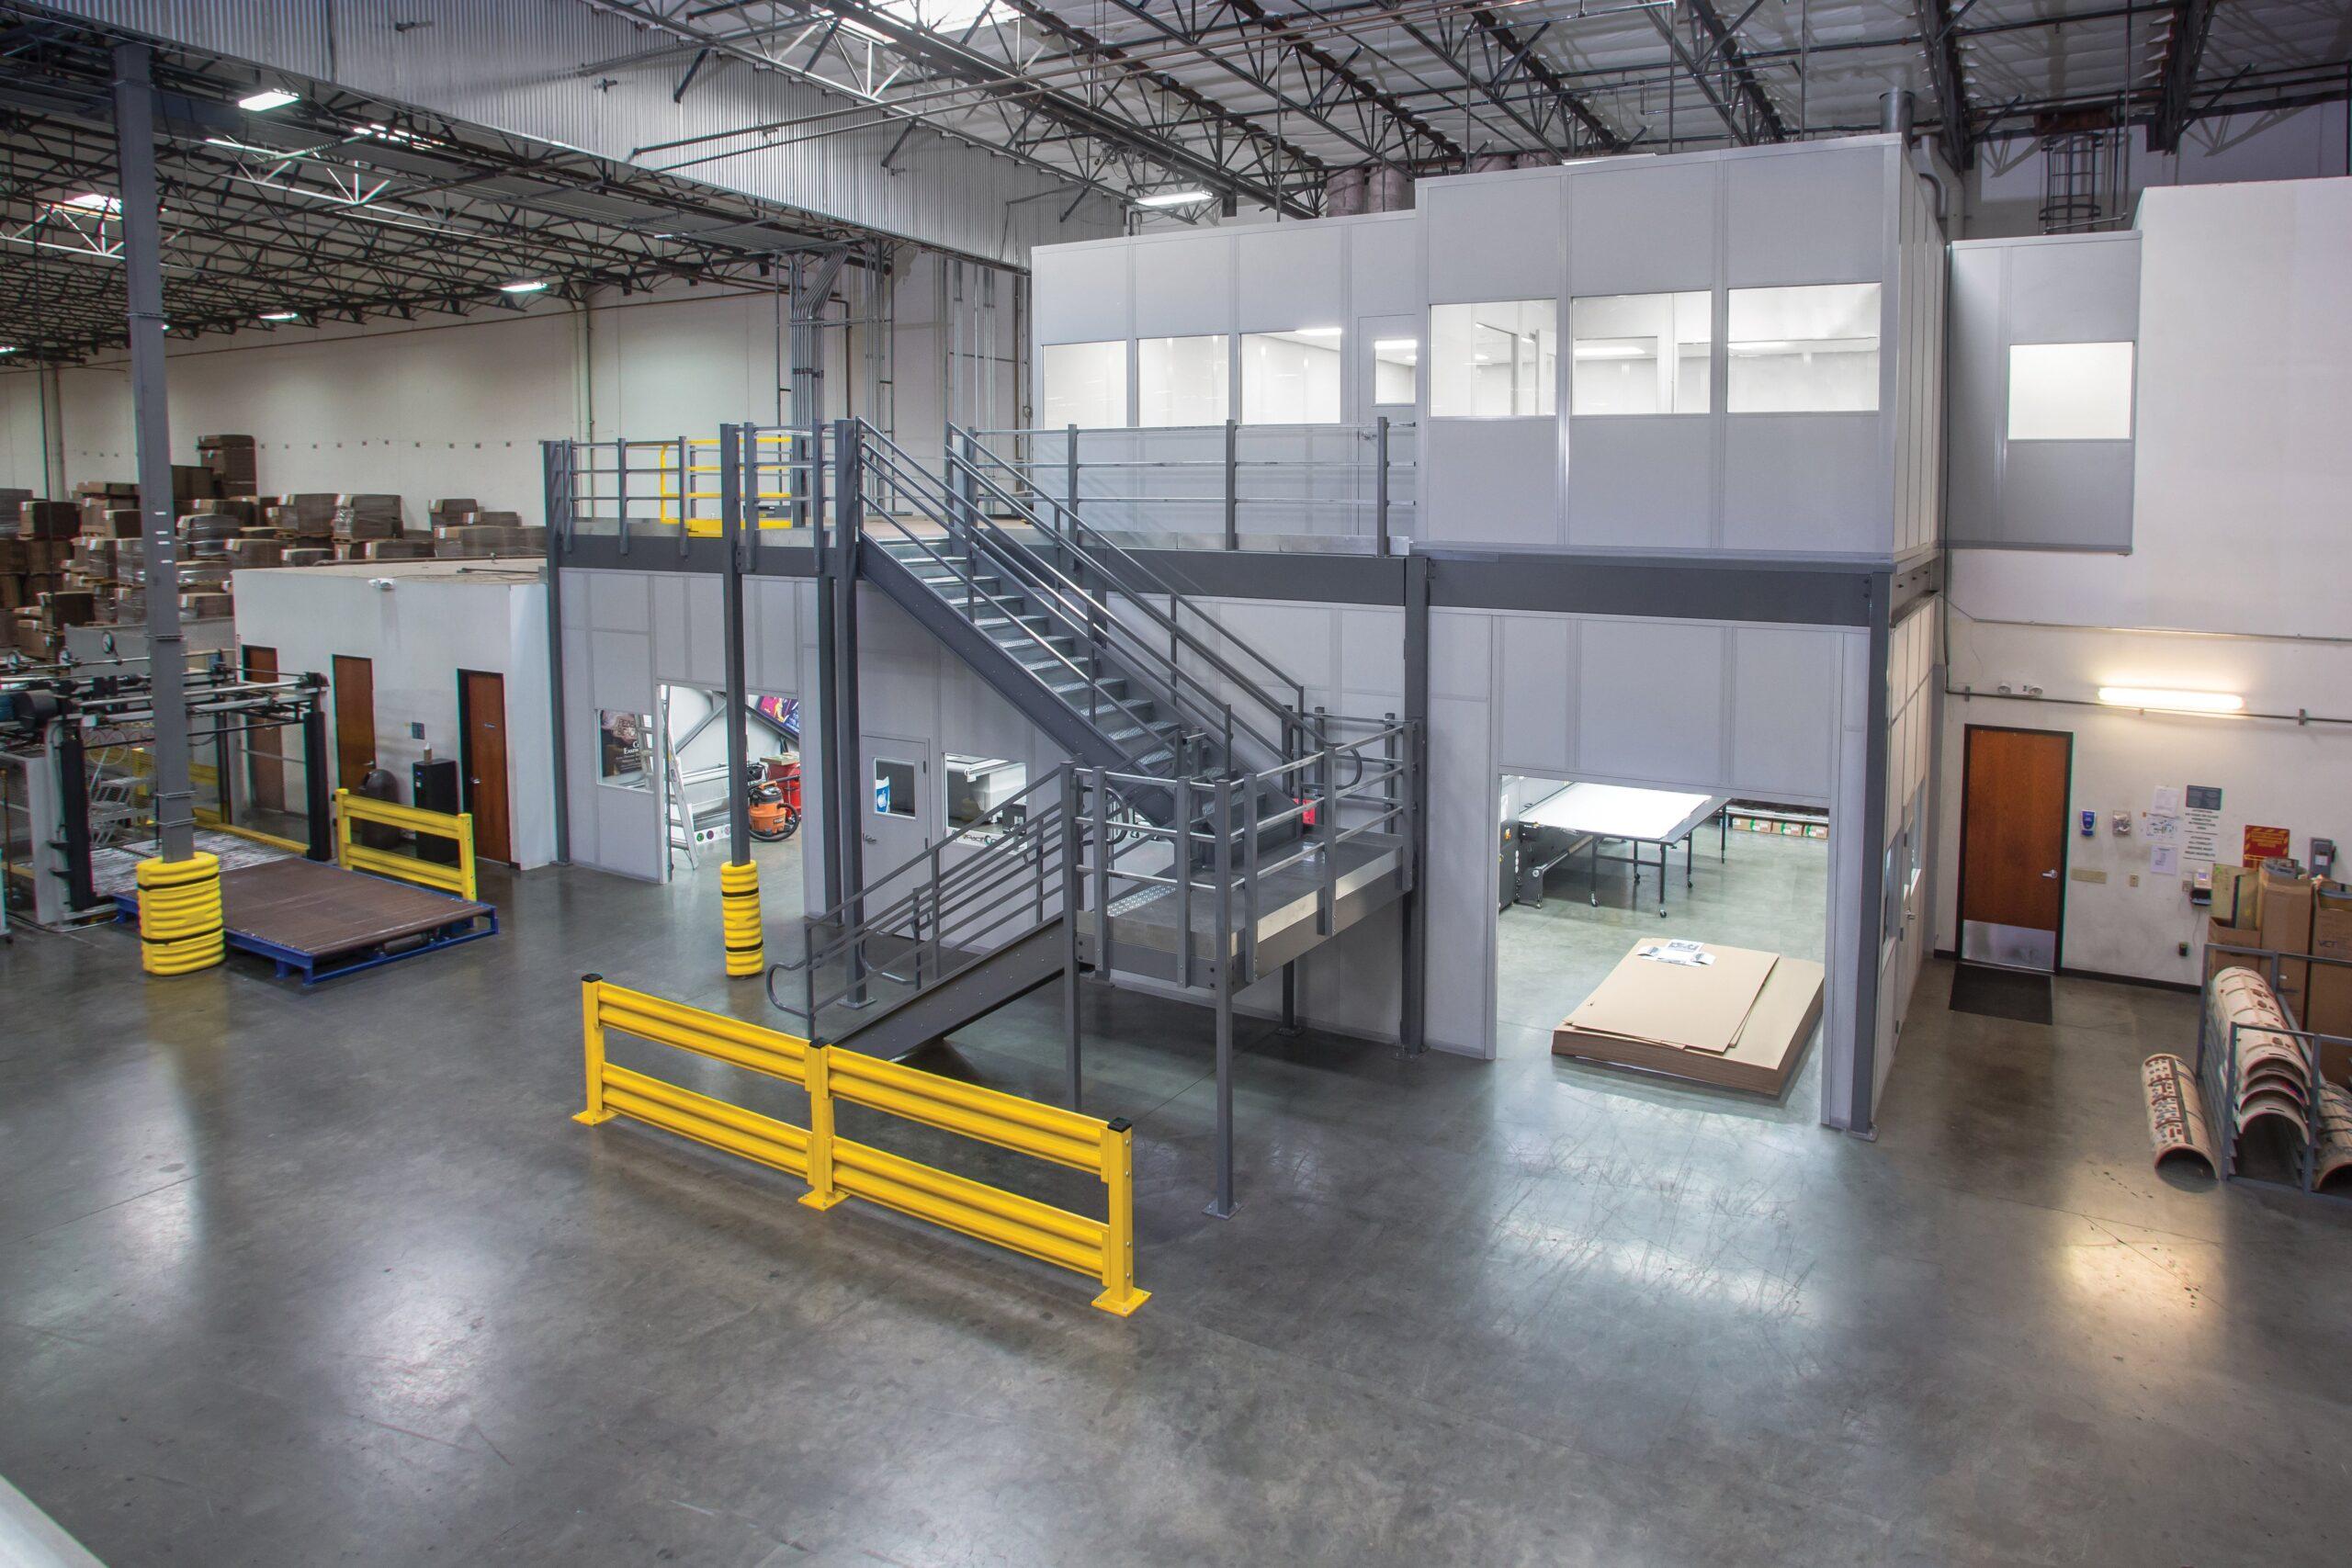 New York Steel Mezzanine Floor With Modular Office on Top